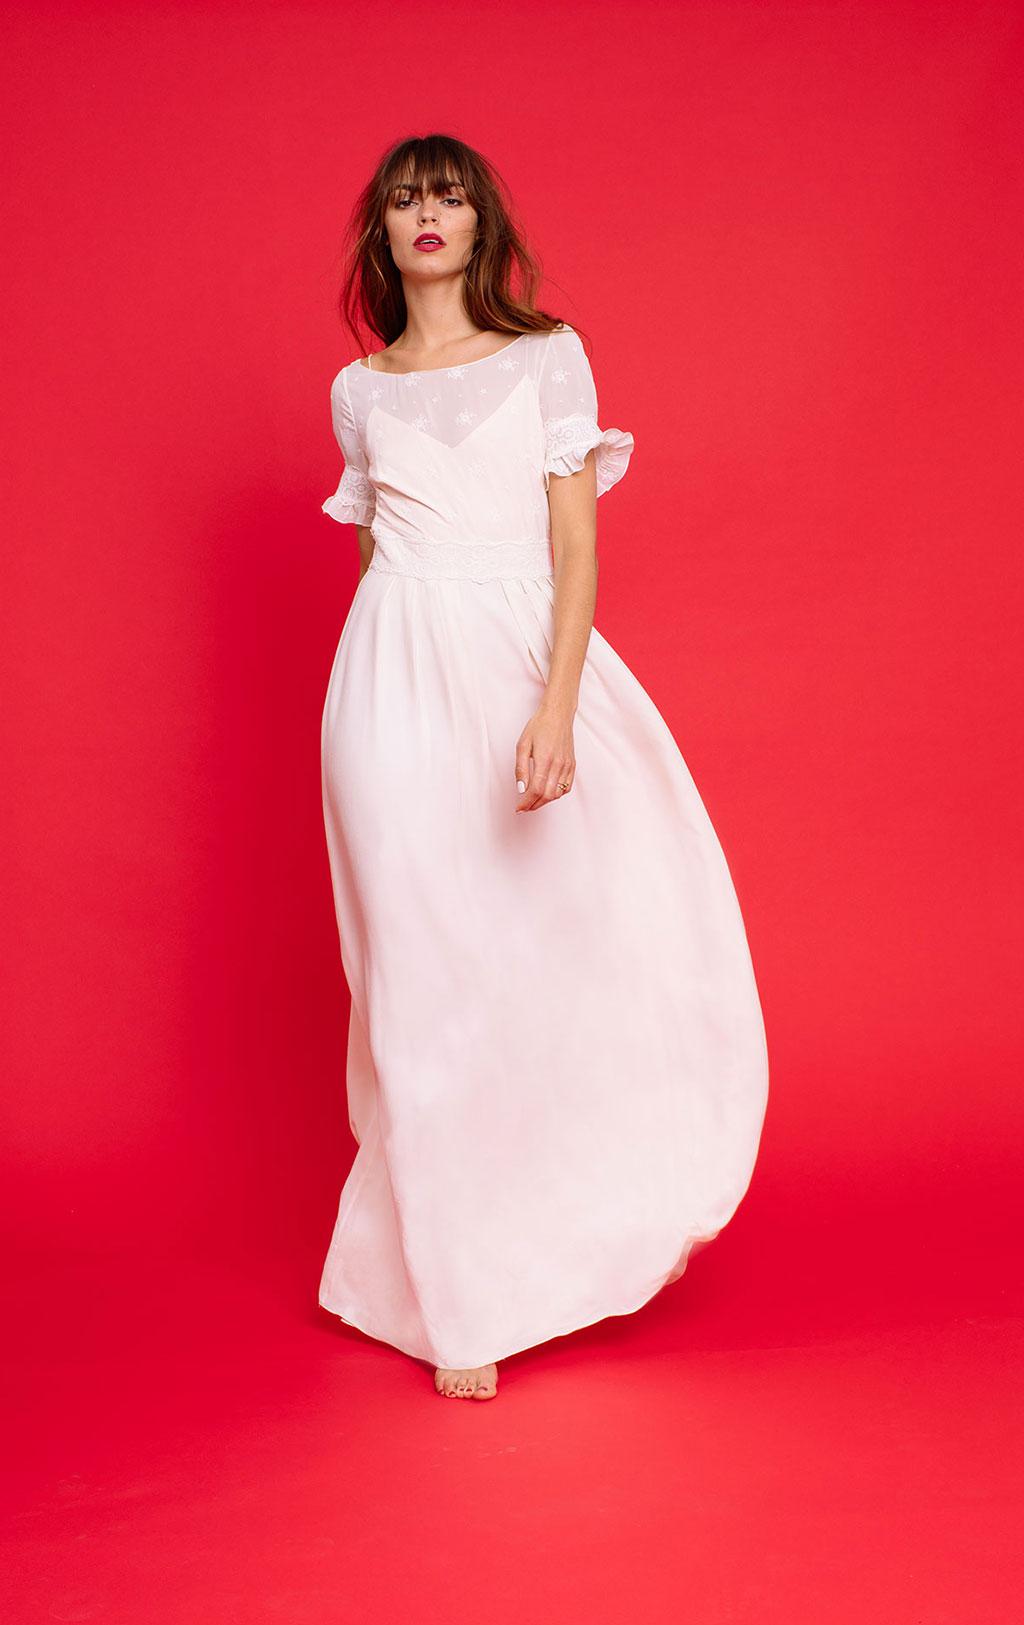 elise-hameau-robes-de-mariee-mariage-wedding-dresses-couture-bridal_collection-permanente_001.jpg